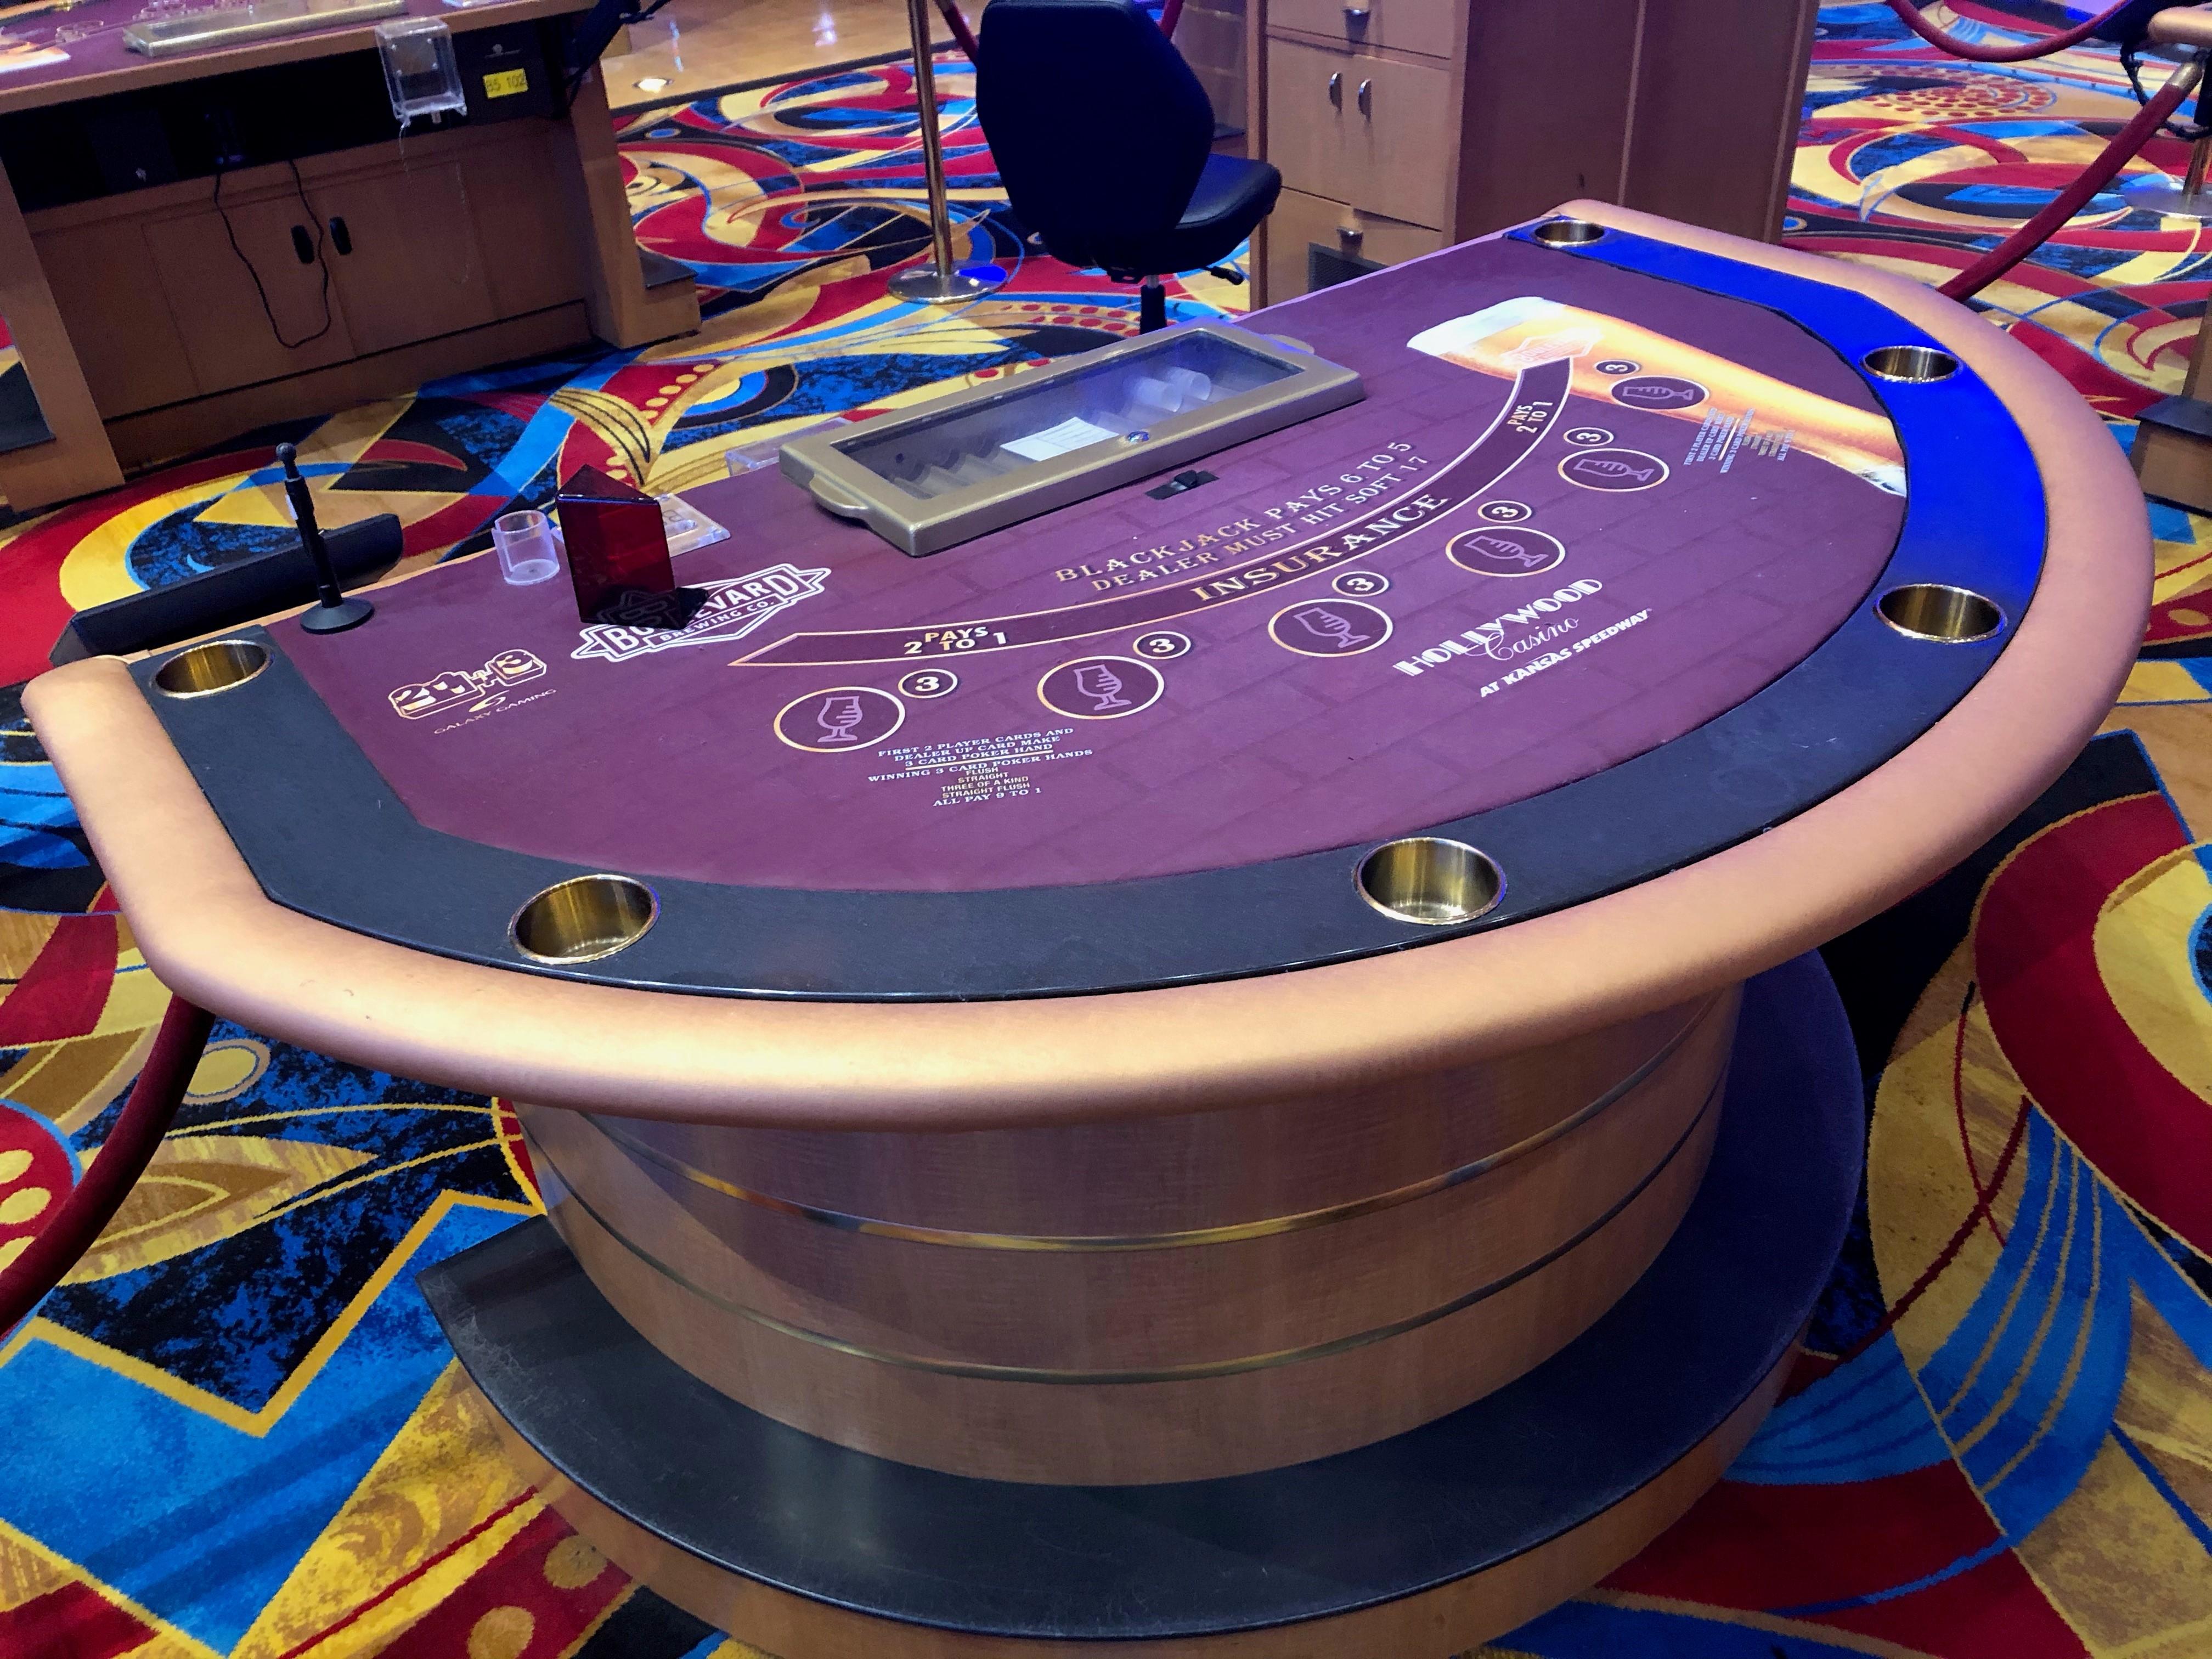 Blogg sida casino 41889